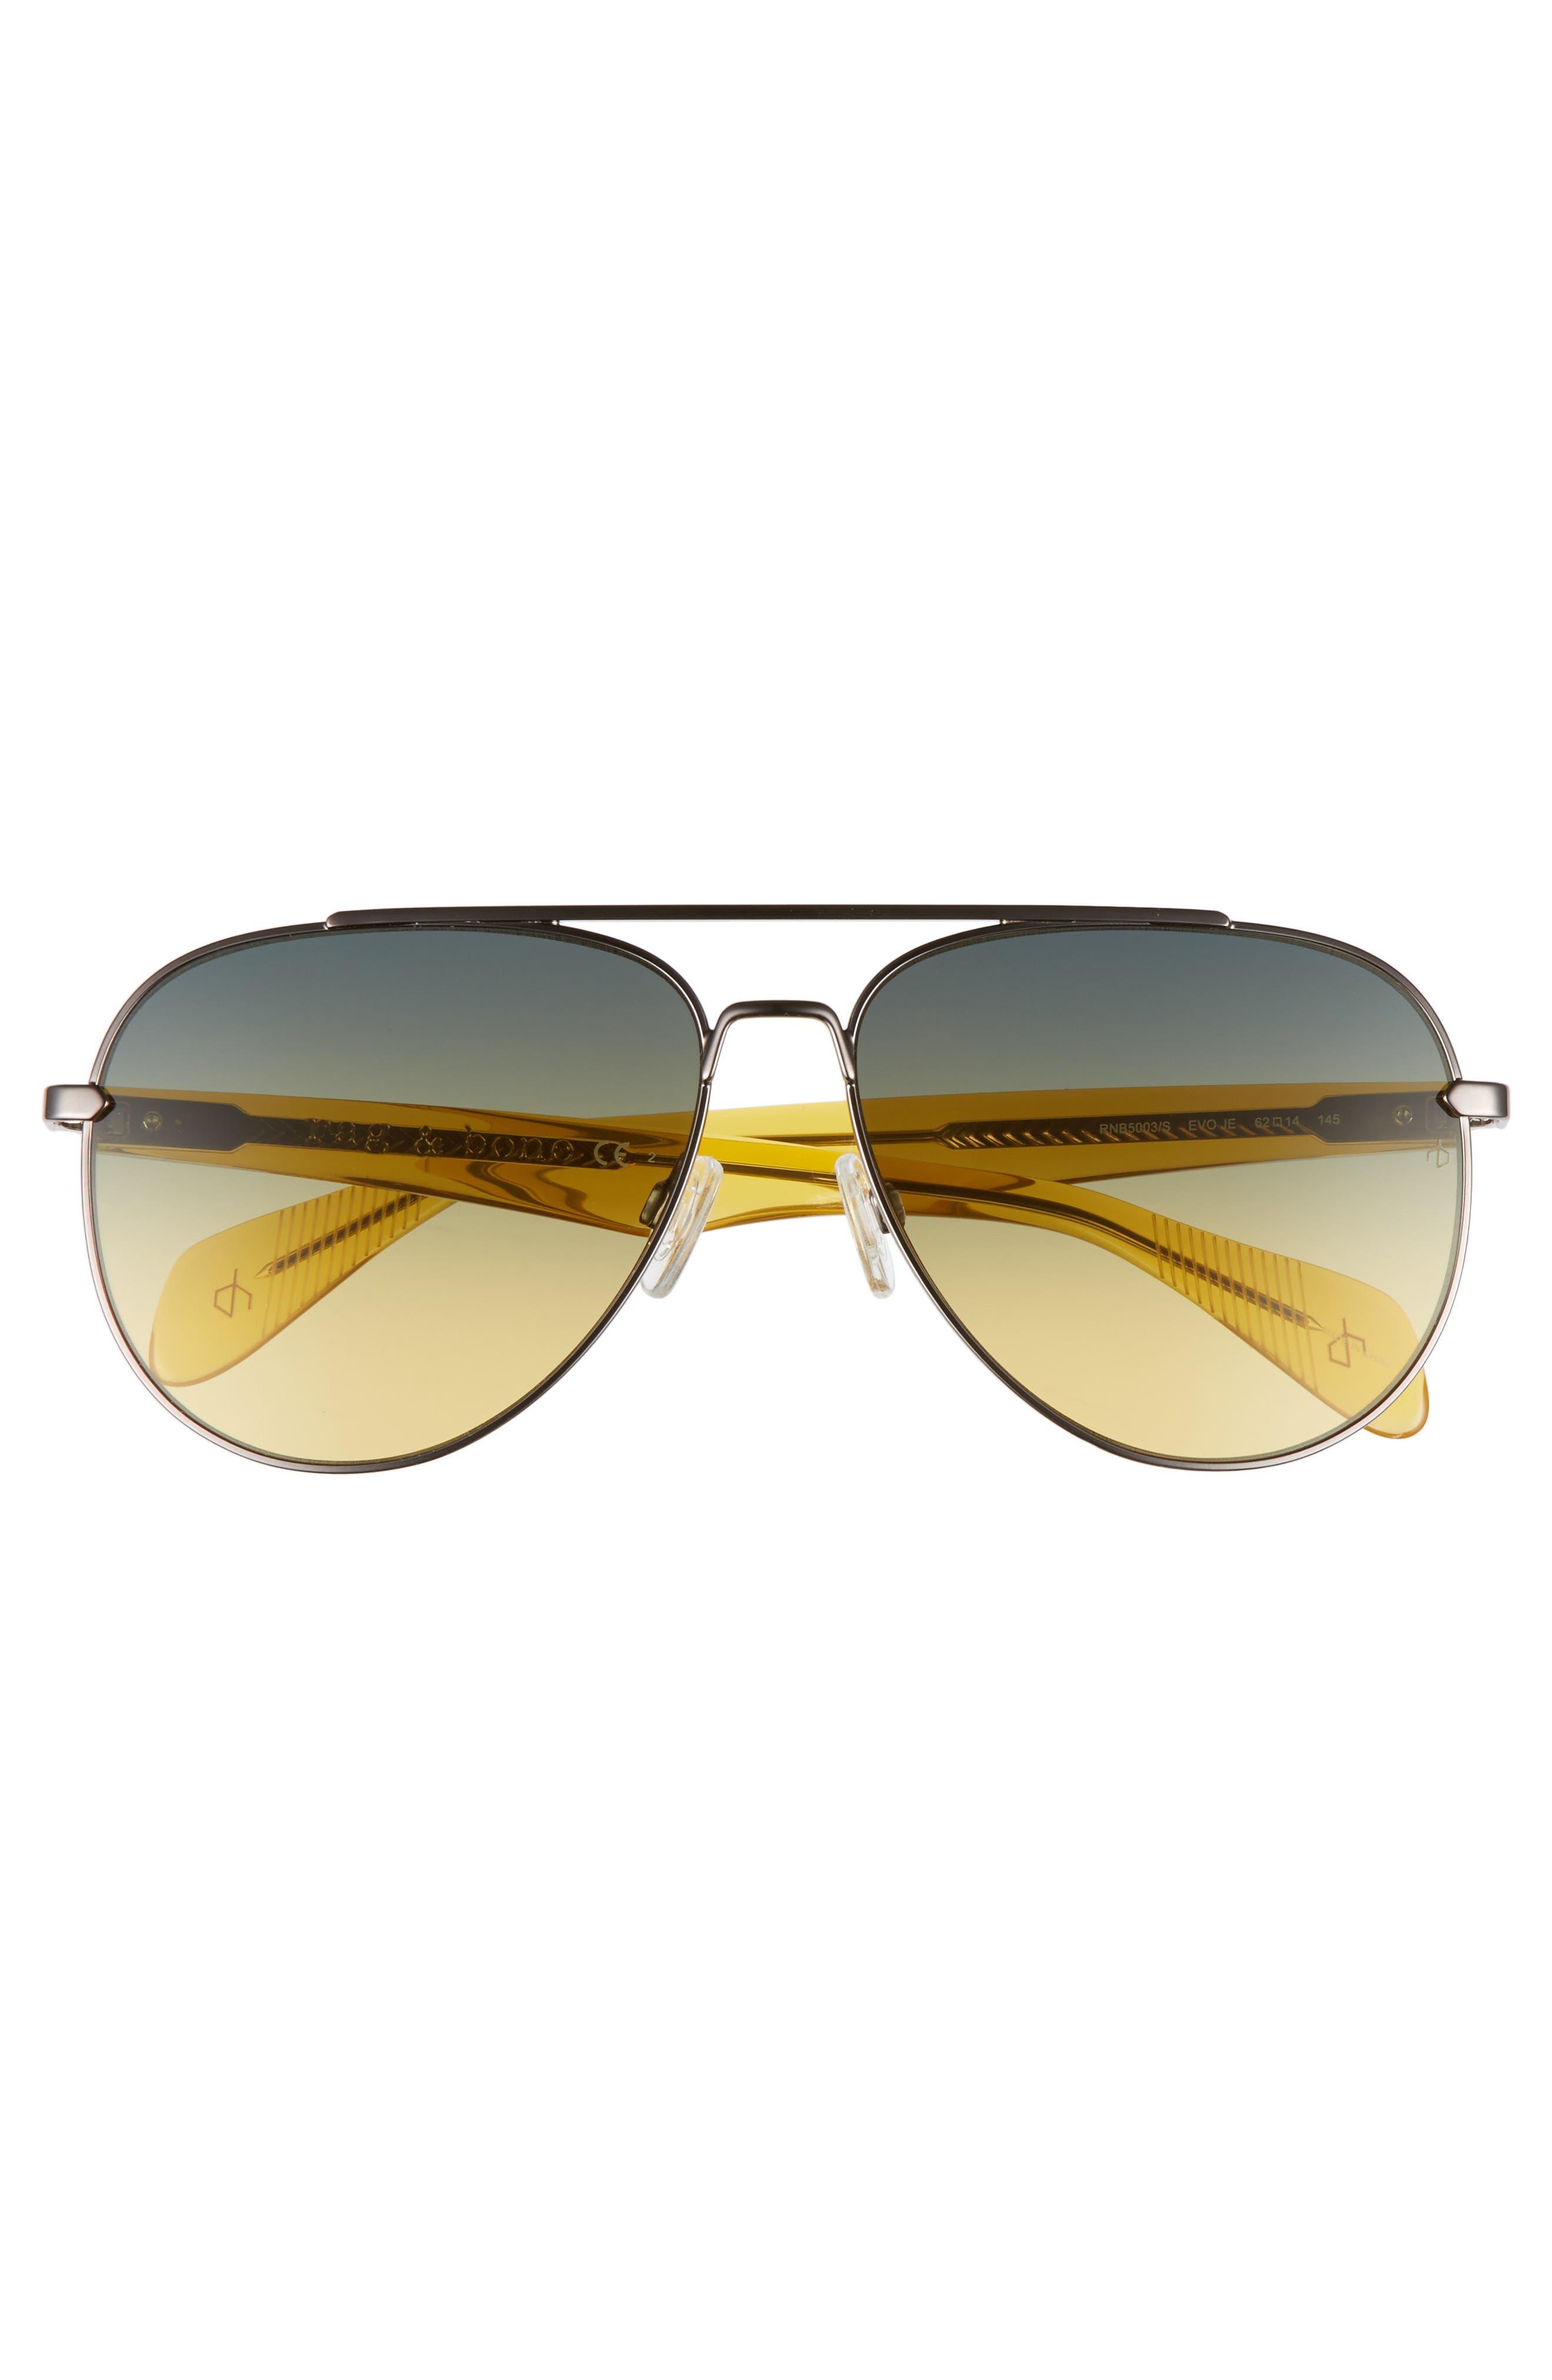 62mm Oversize Aviator Sunglasses,                             Alternate thumbnail 2, color,                             220